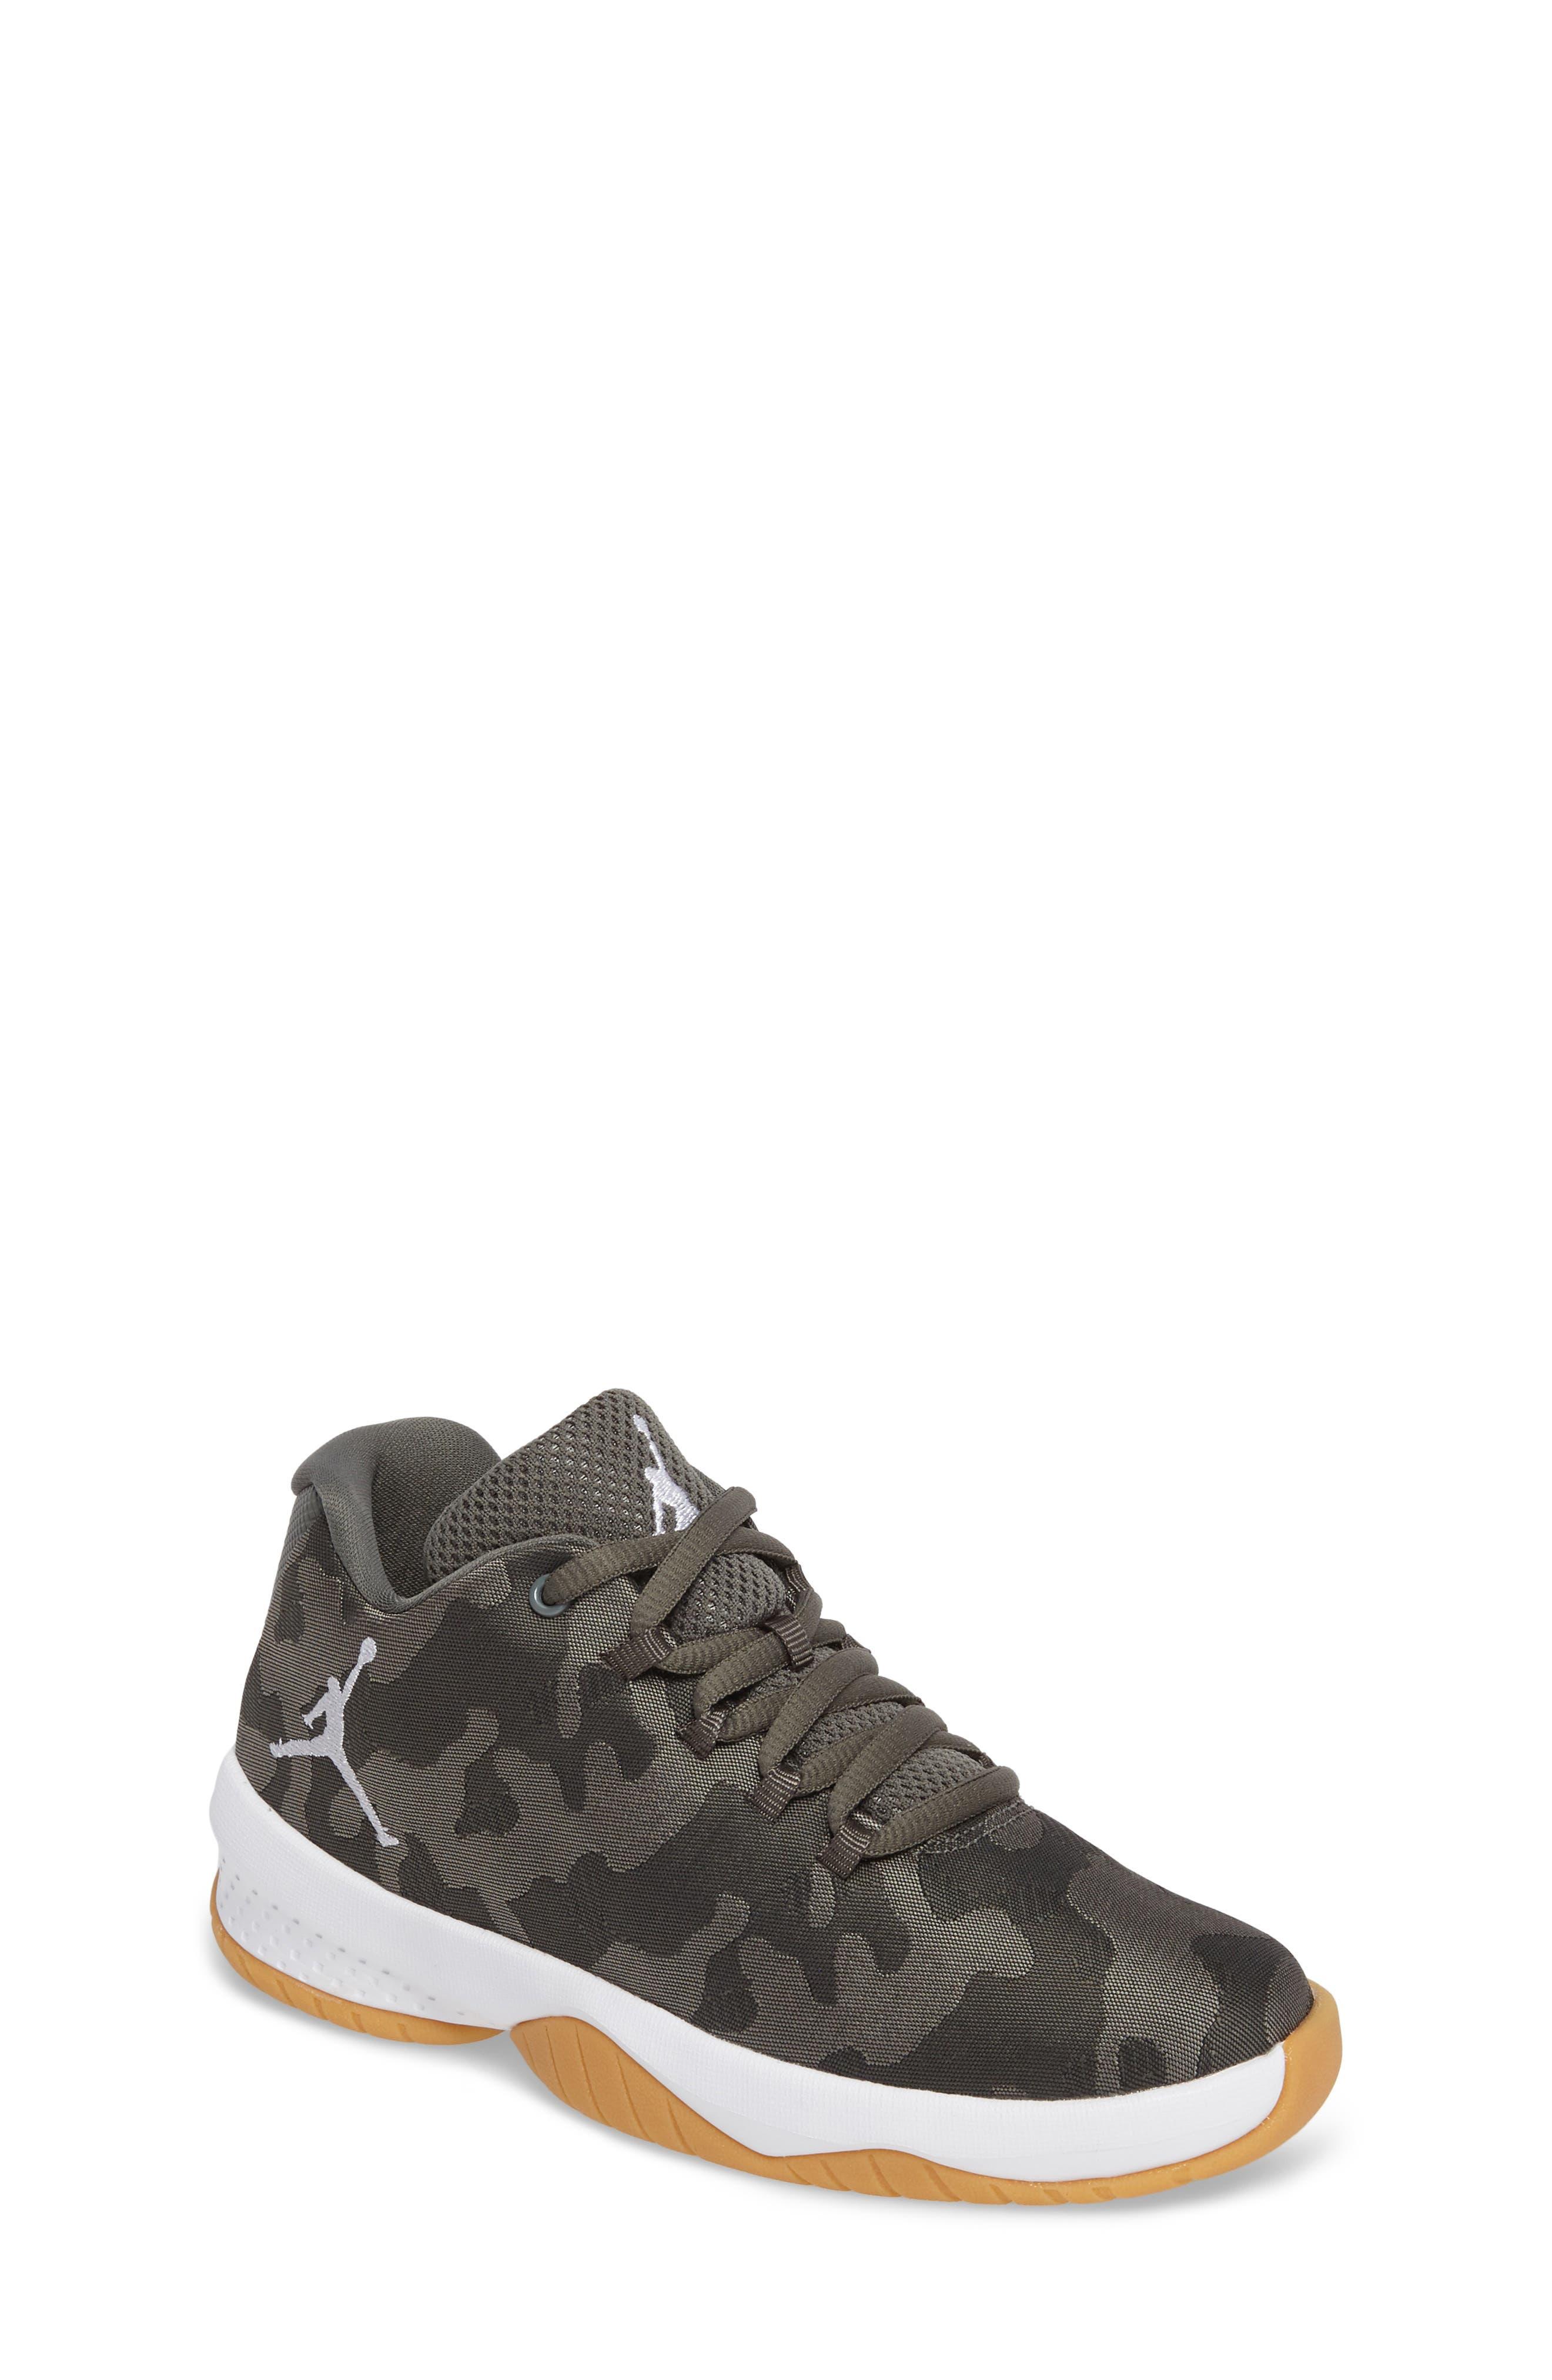 B. Fly Basketball Shoe,                         Main,                         color, 250